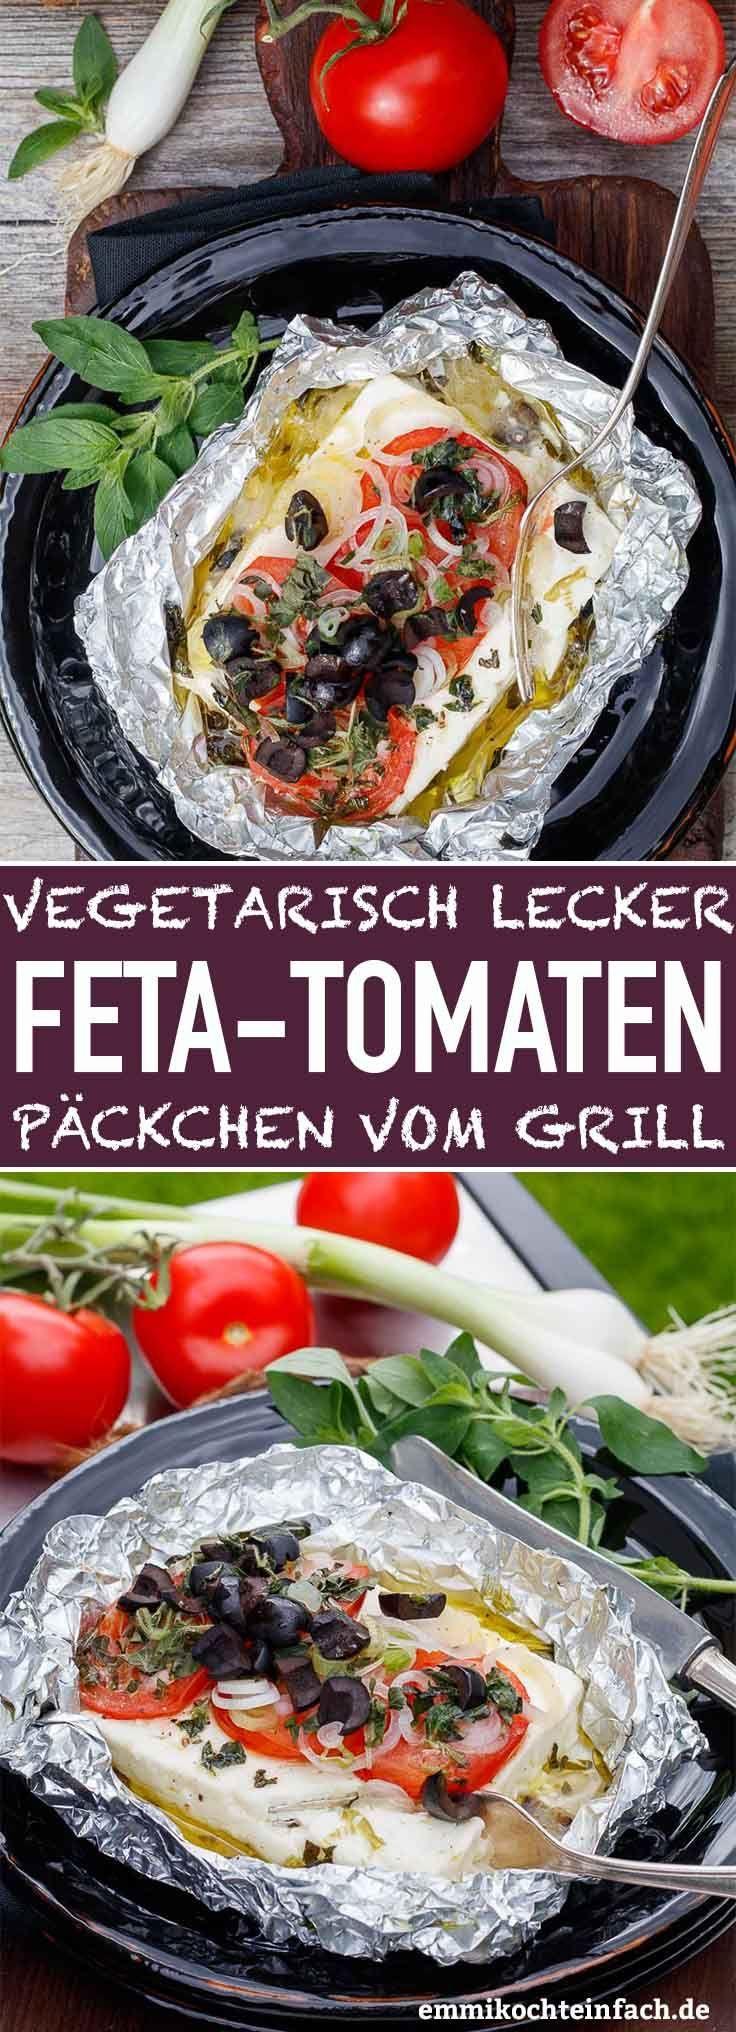 Feta-Tomaten-Päckchen vom Grill Feta-Tomaten-Päckchen vom Grill  Recipes Recipes Easy